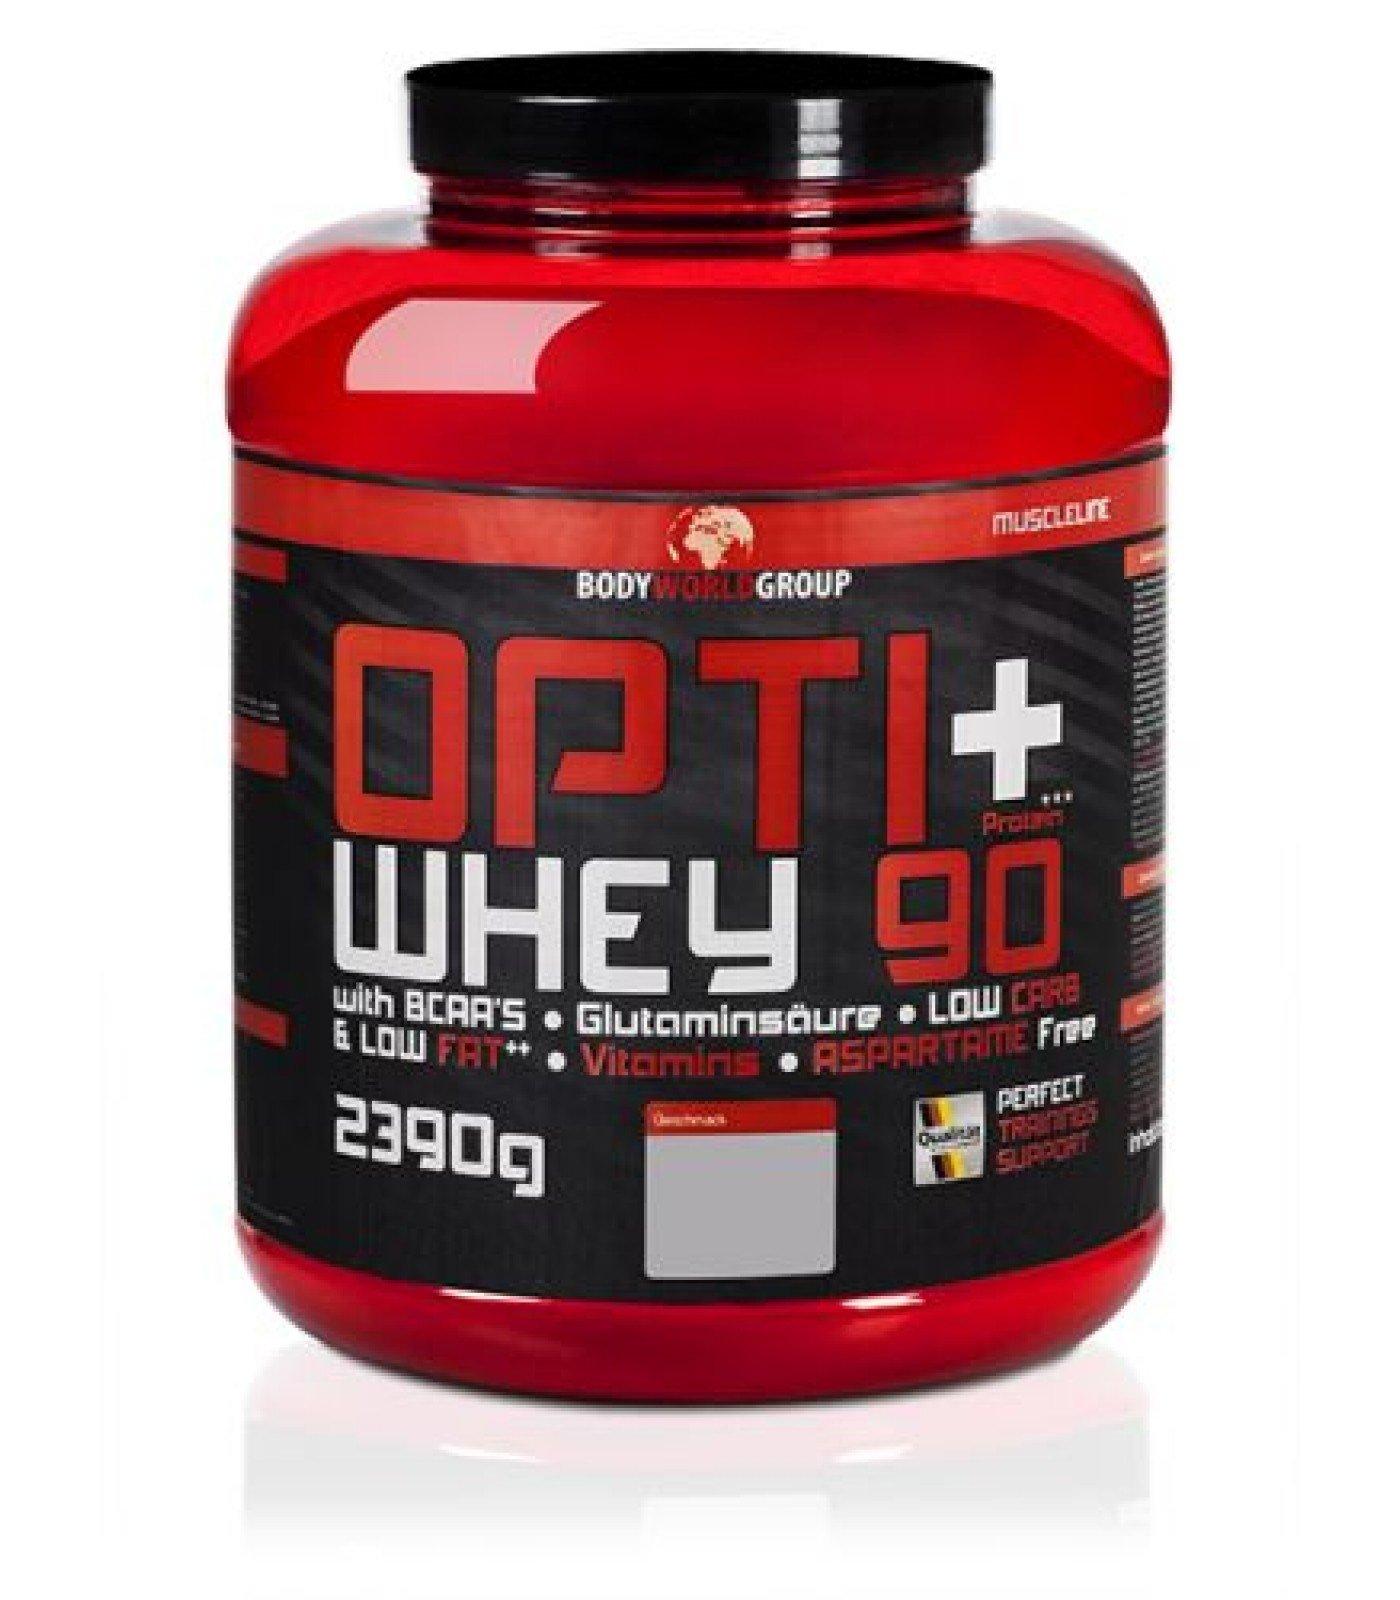 BWG - Opti+ Whey 90 Protein / 2390 gr